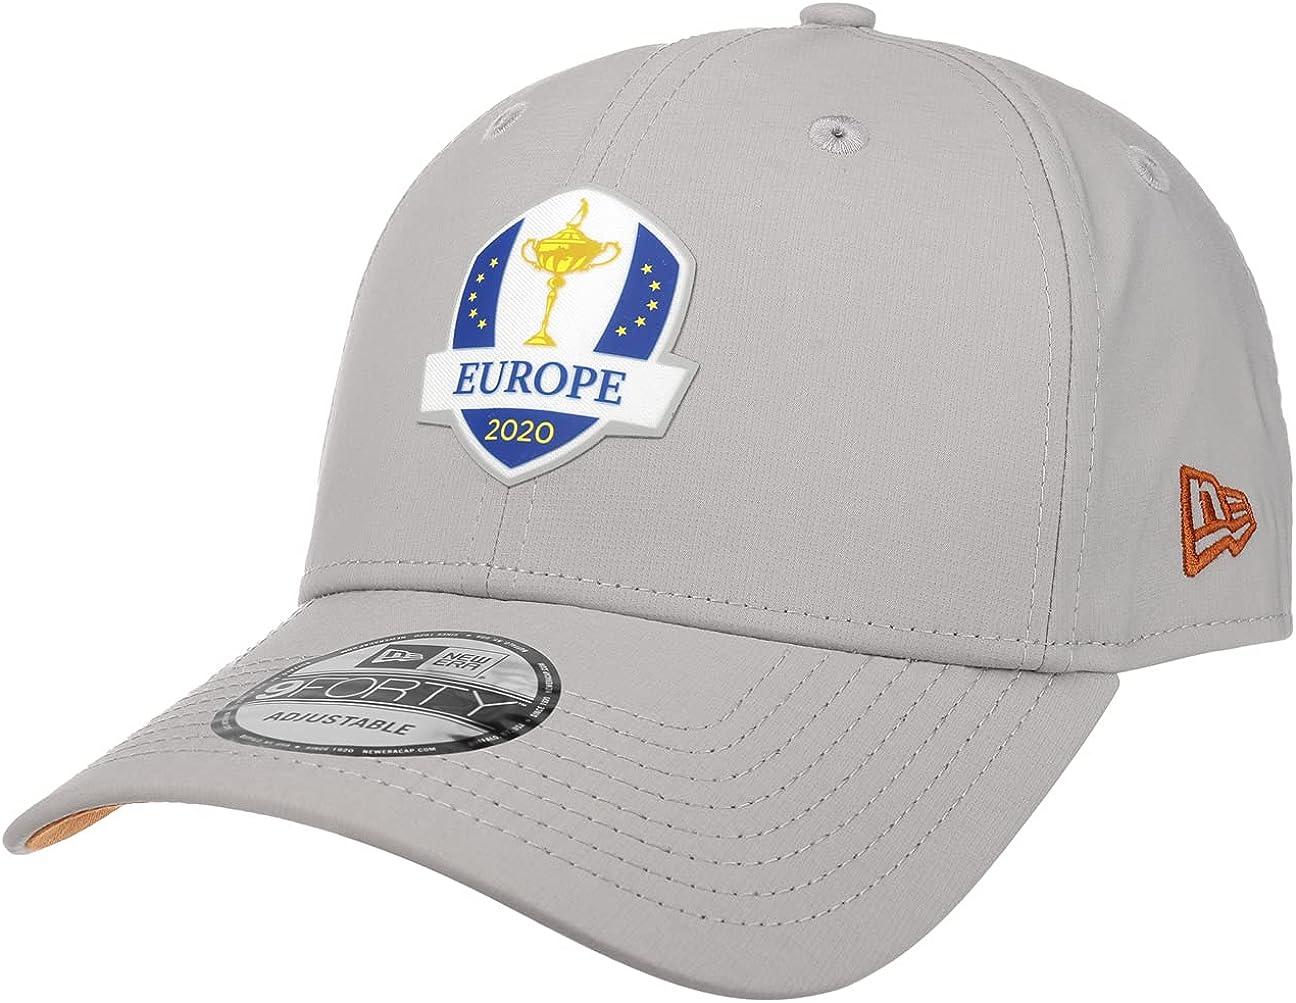 New Era 9Forty PGA Ryder Cup CapEra Baseball Cap Curved Brim